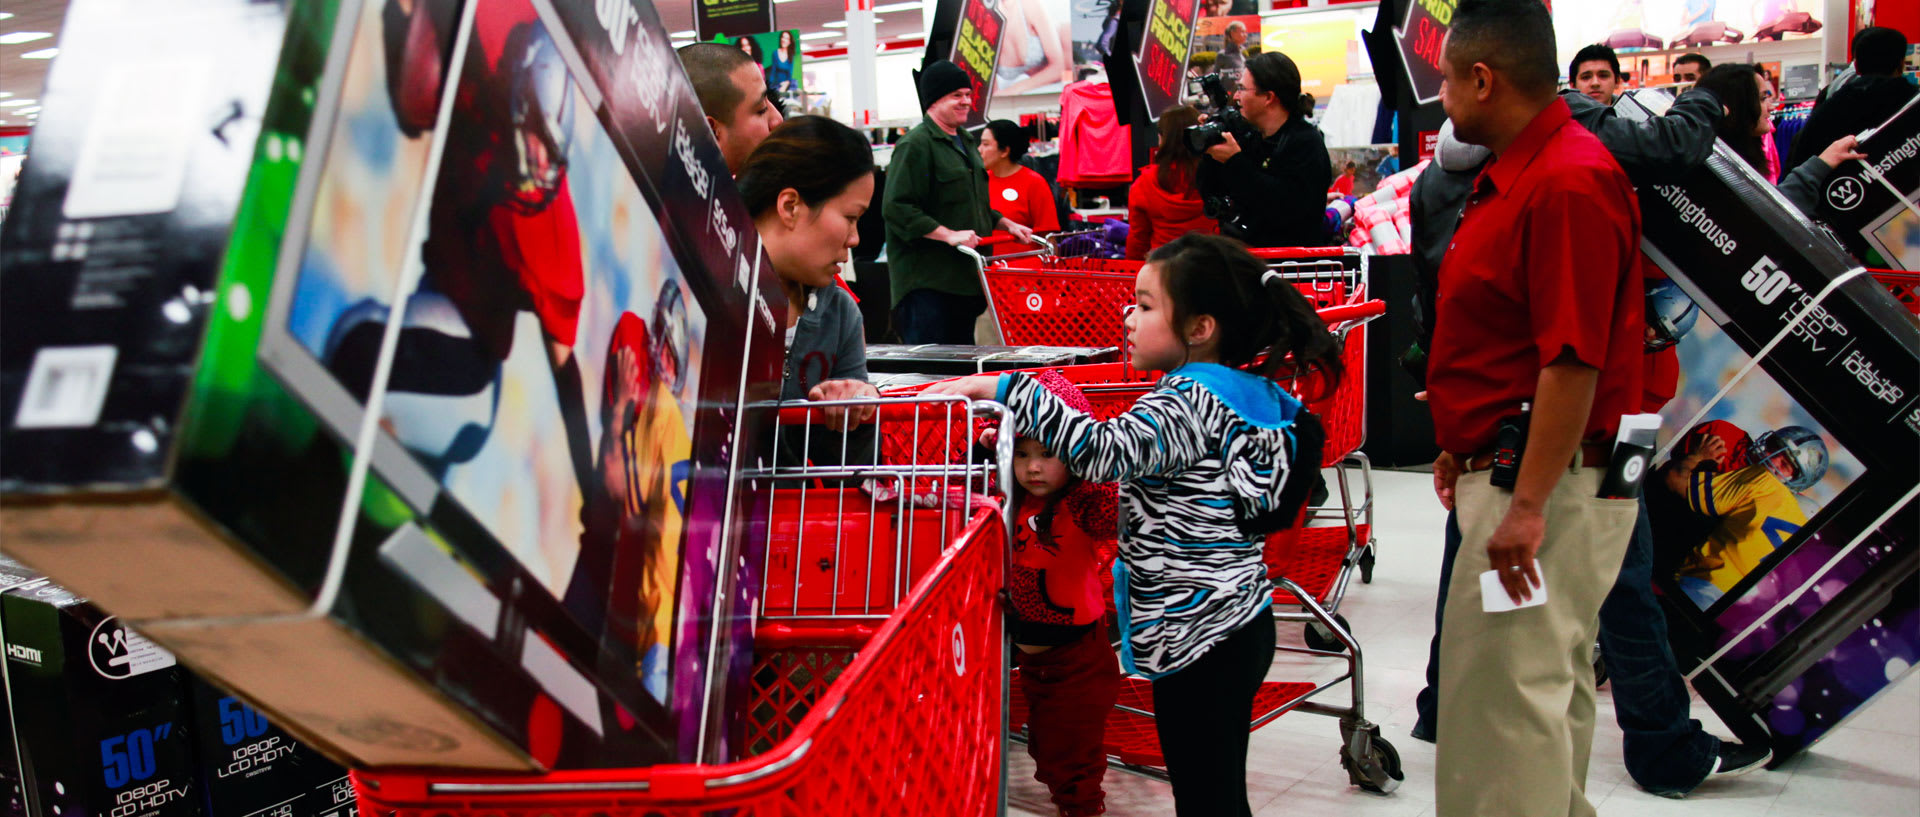 Has Black Friday Regained Its Mojo Consumer Reports